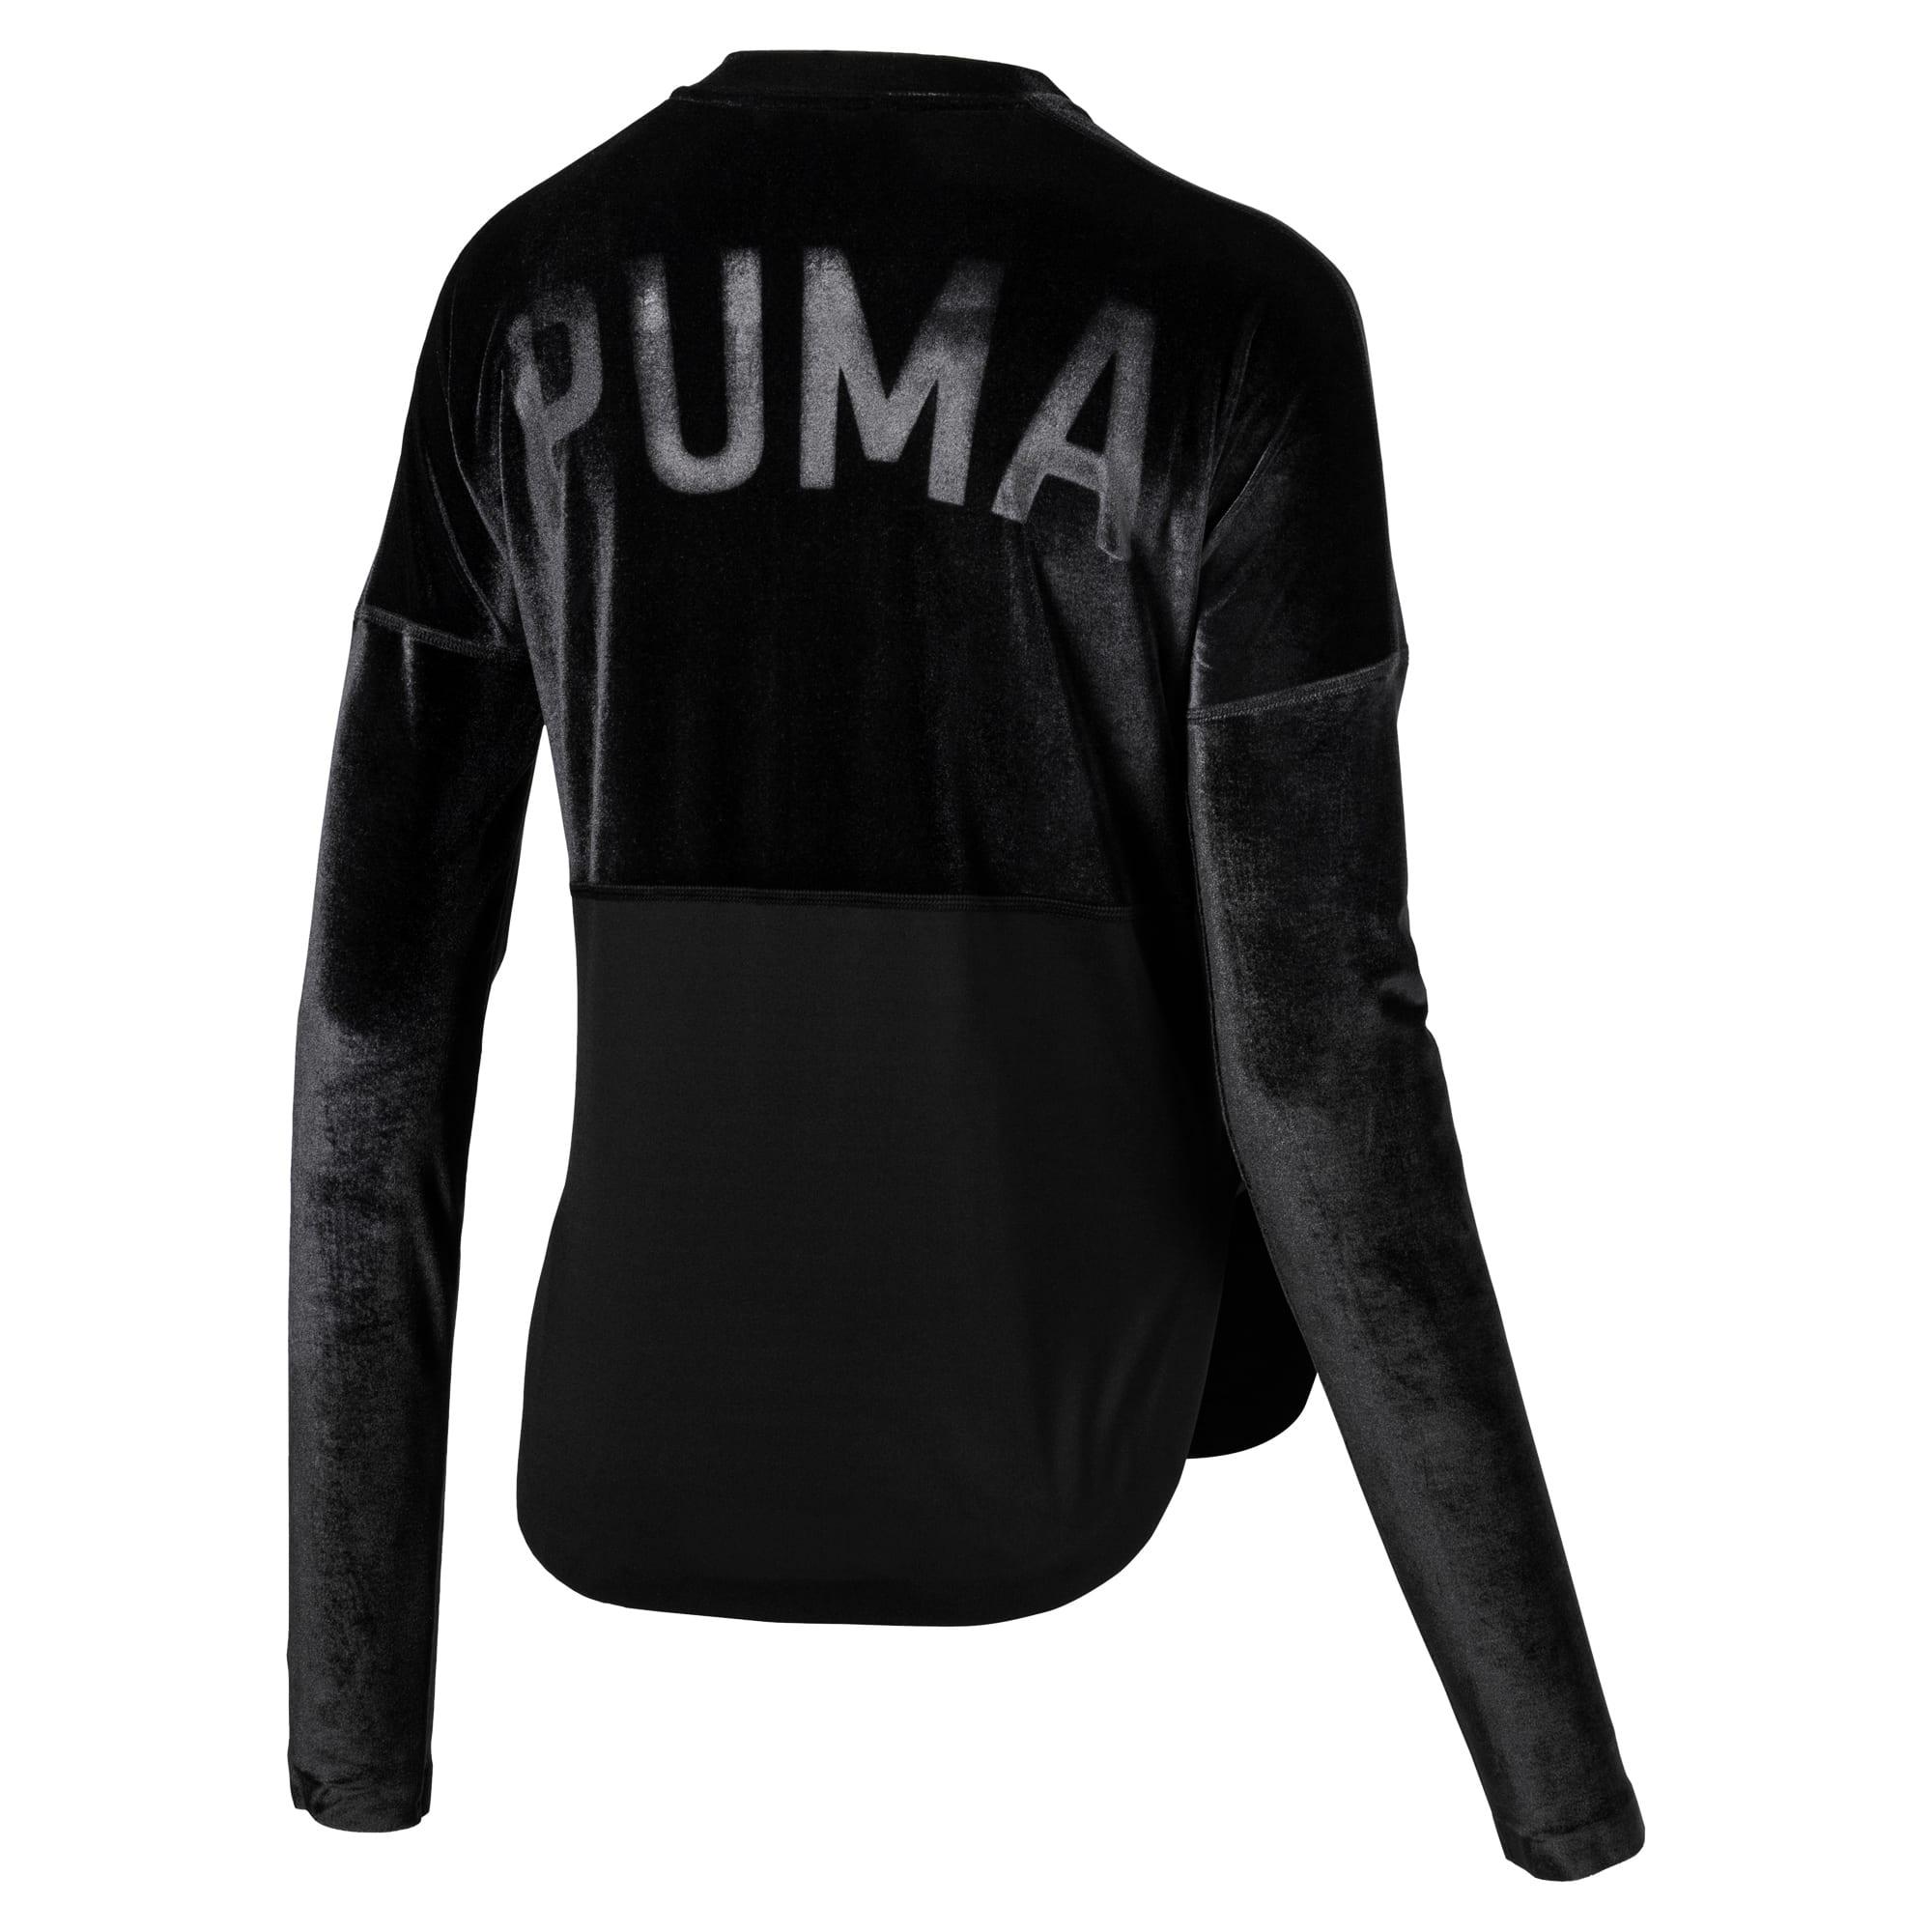 Puma Womens Statement Jacket Velvet 516564-01